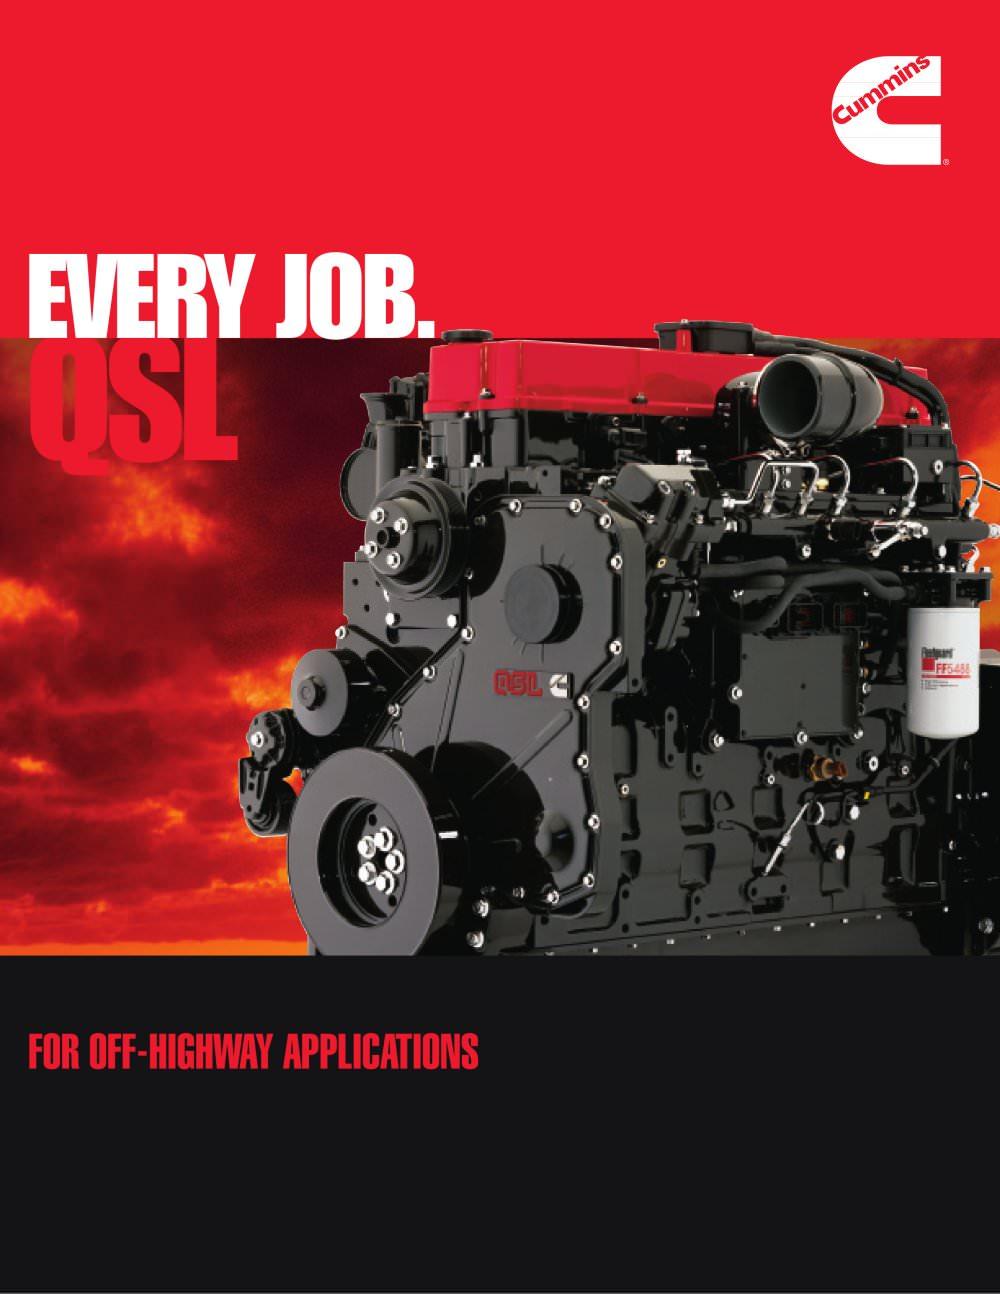 qsl cummins inc pdf catalogue technical documentation brochure rh pdf  directindustry com Cummins Qsol Cummins Diesel Engines